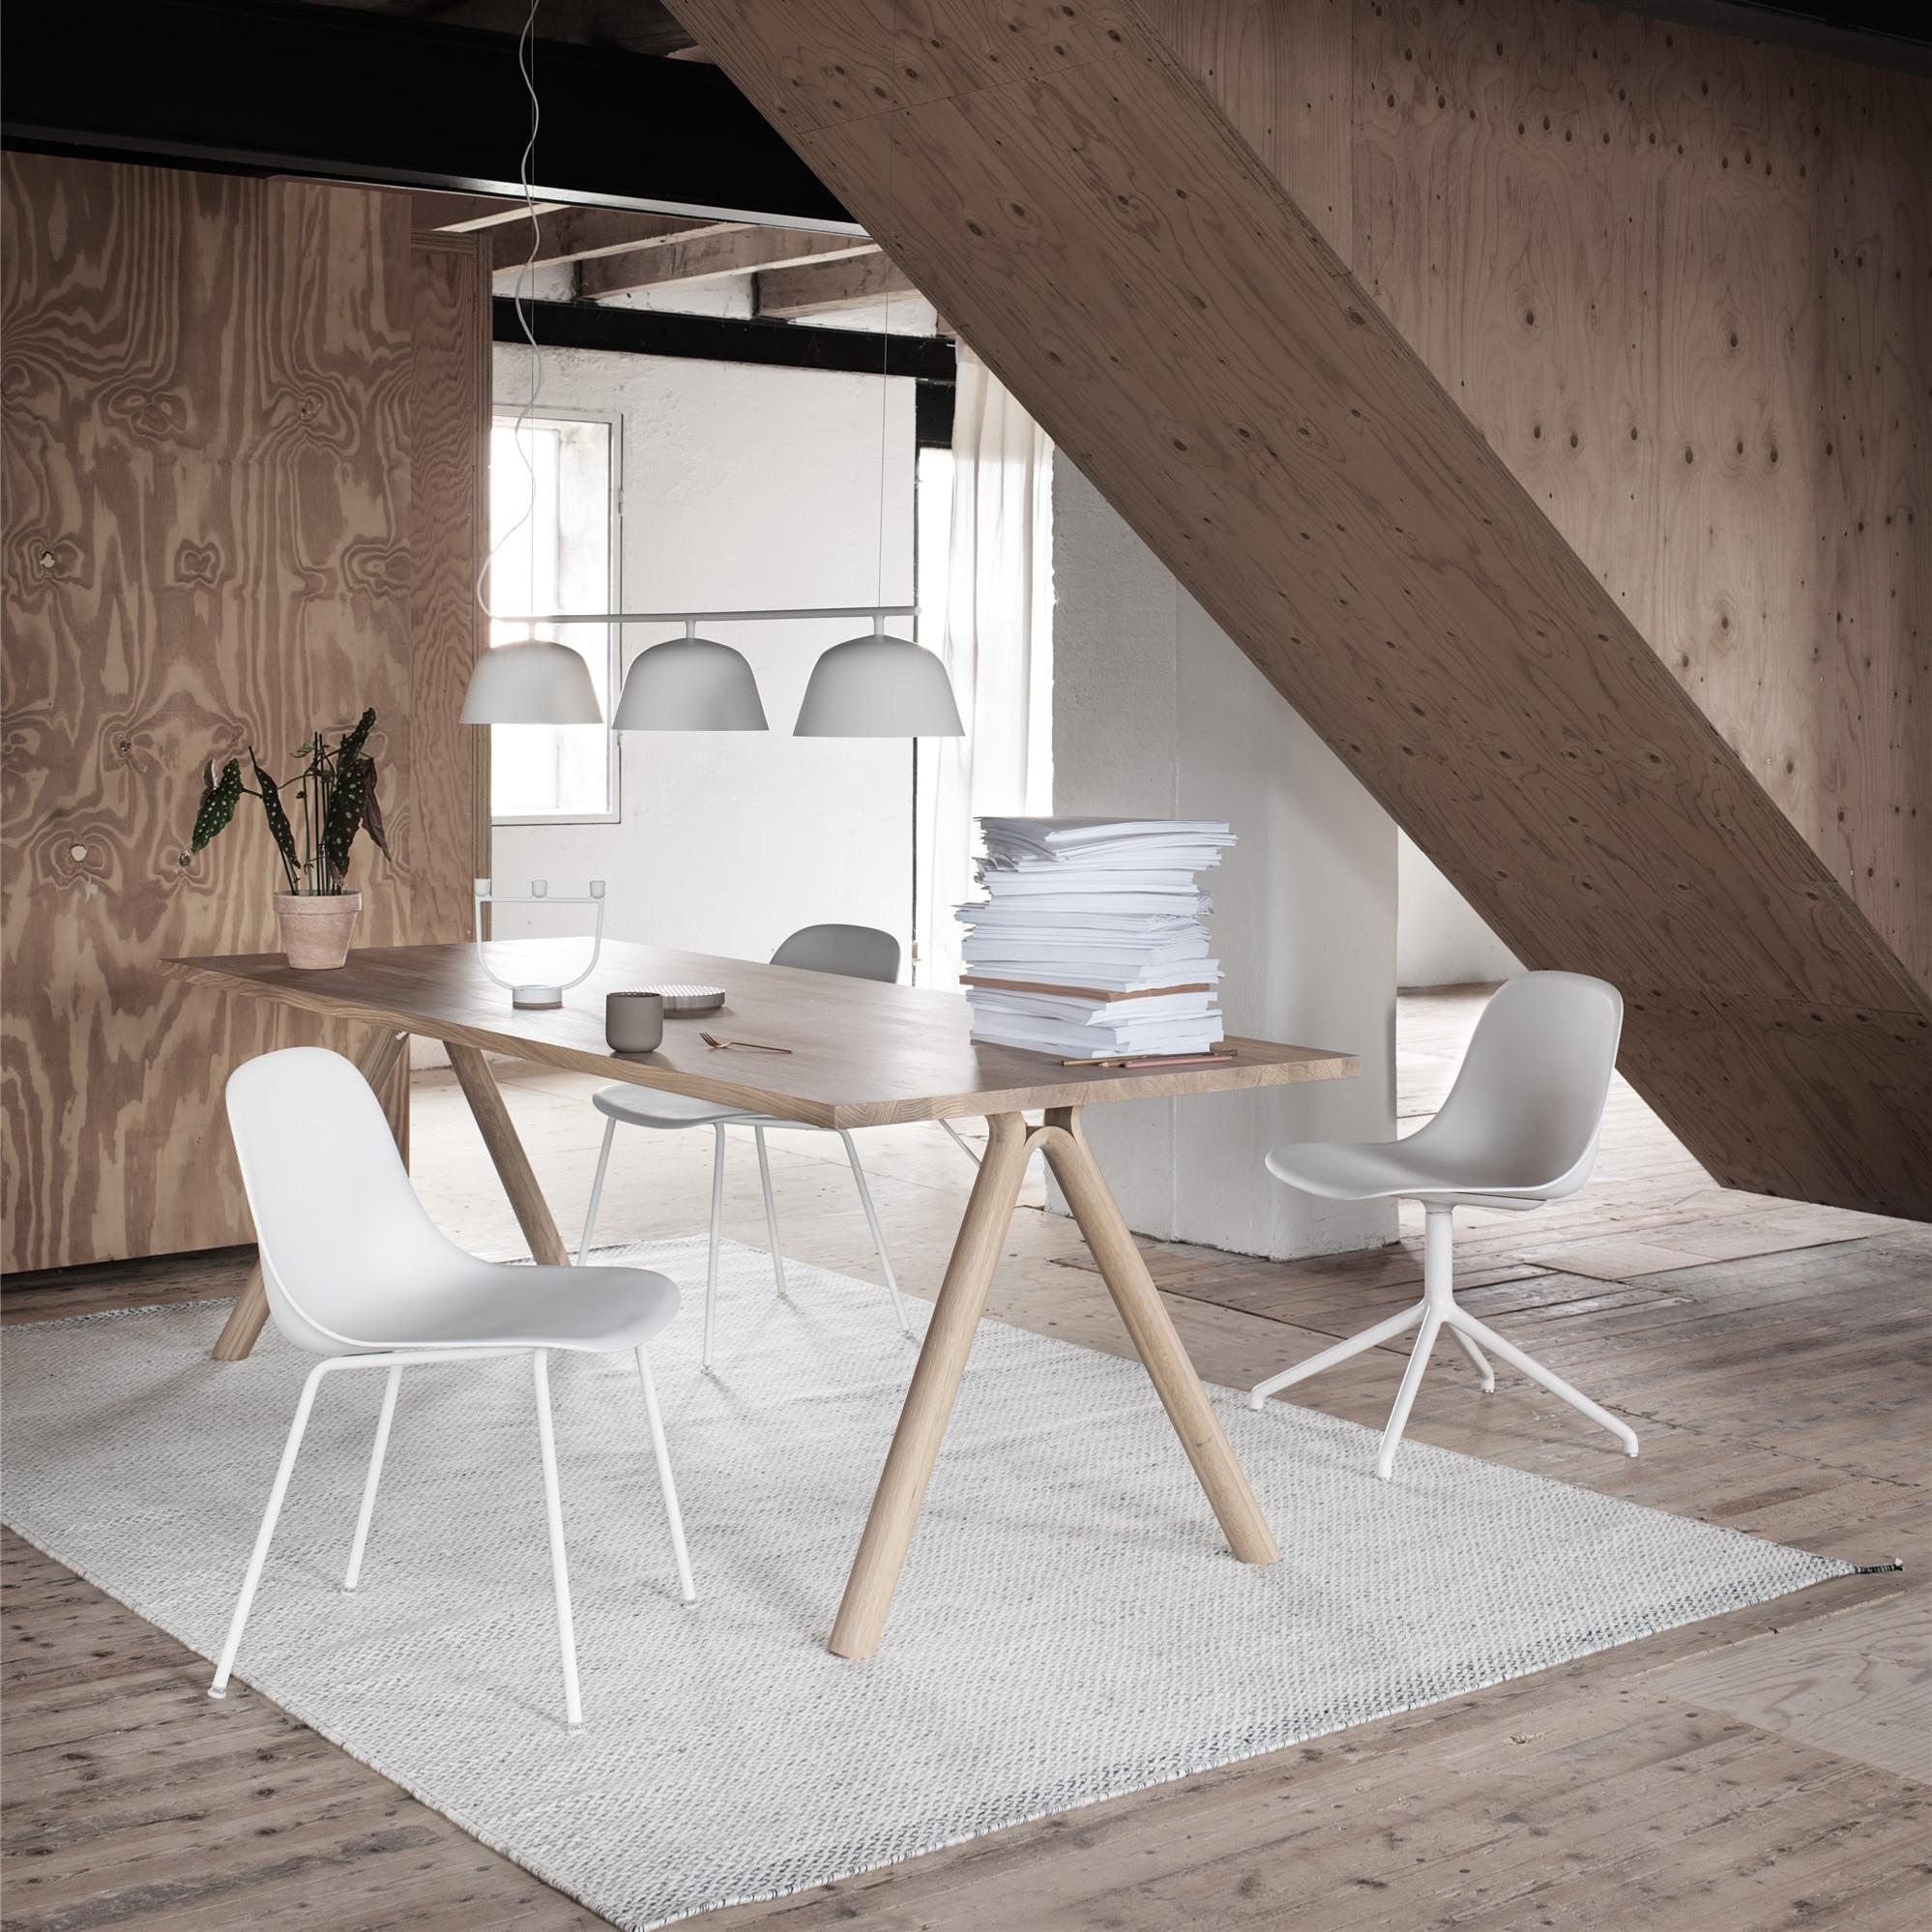 Muuto, Fiber Chair, Black